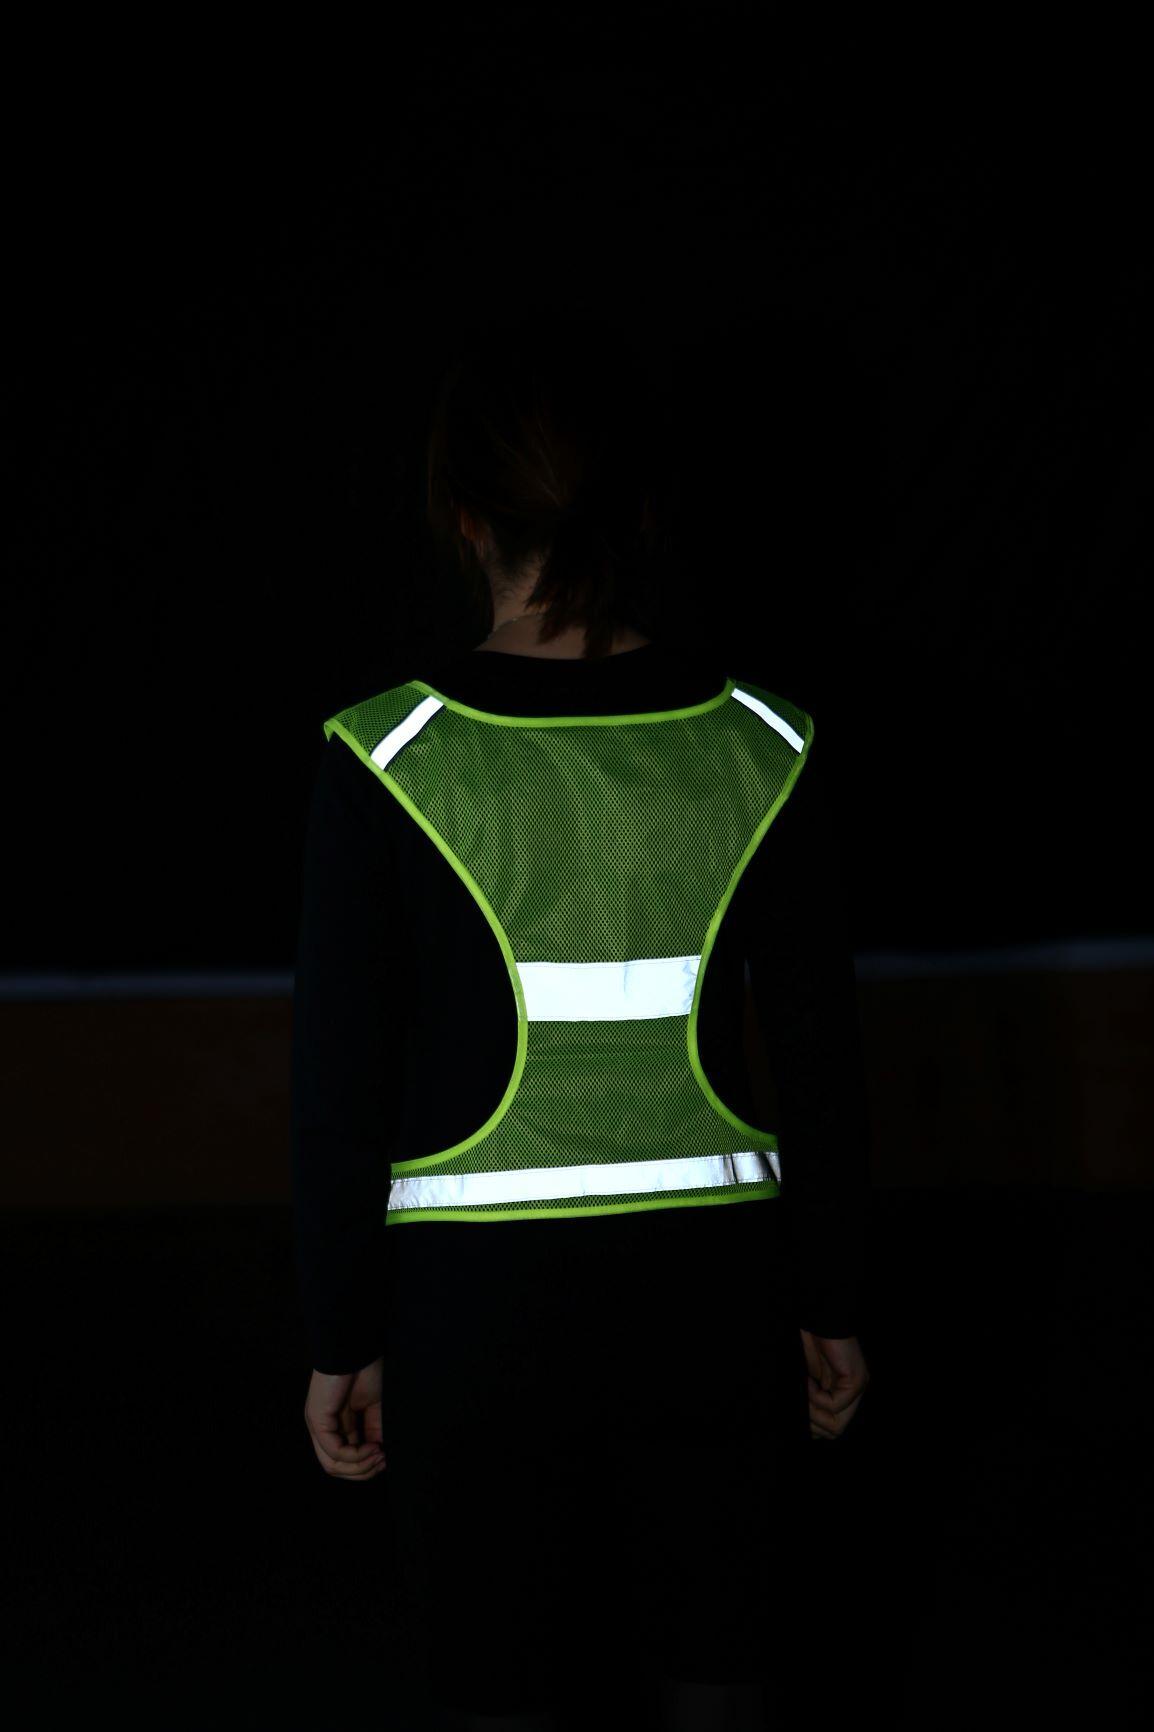 Reflective Safety Vest Biking